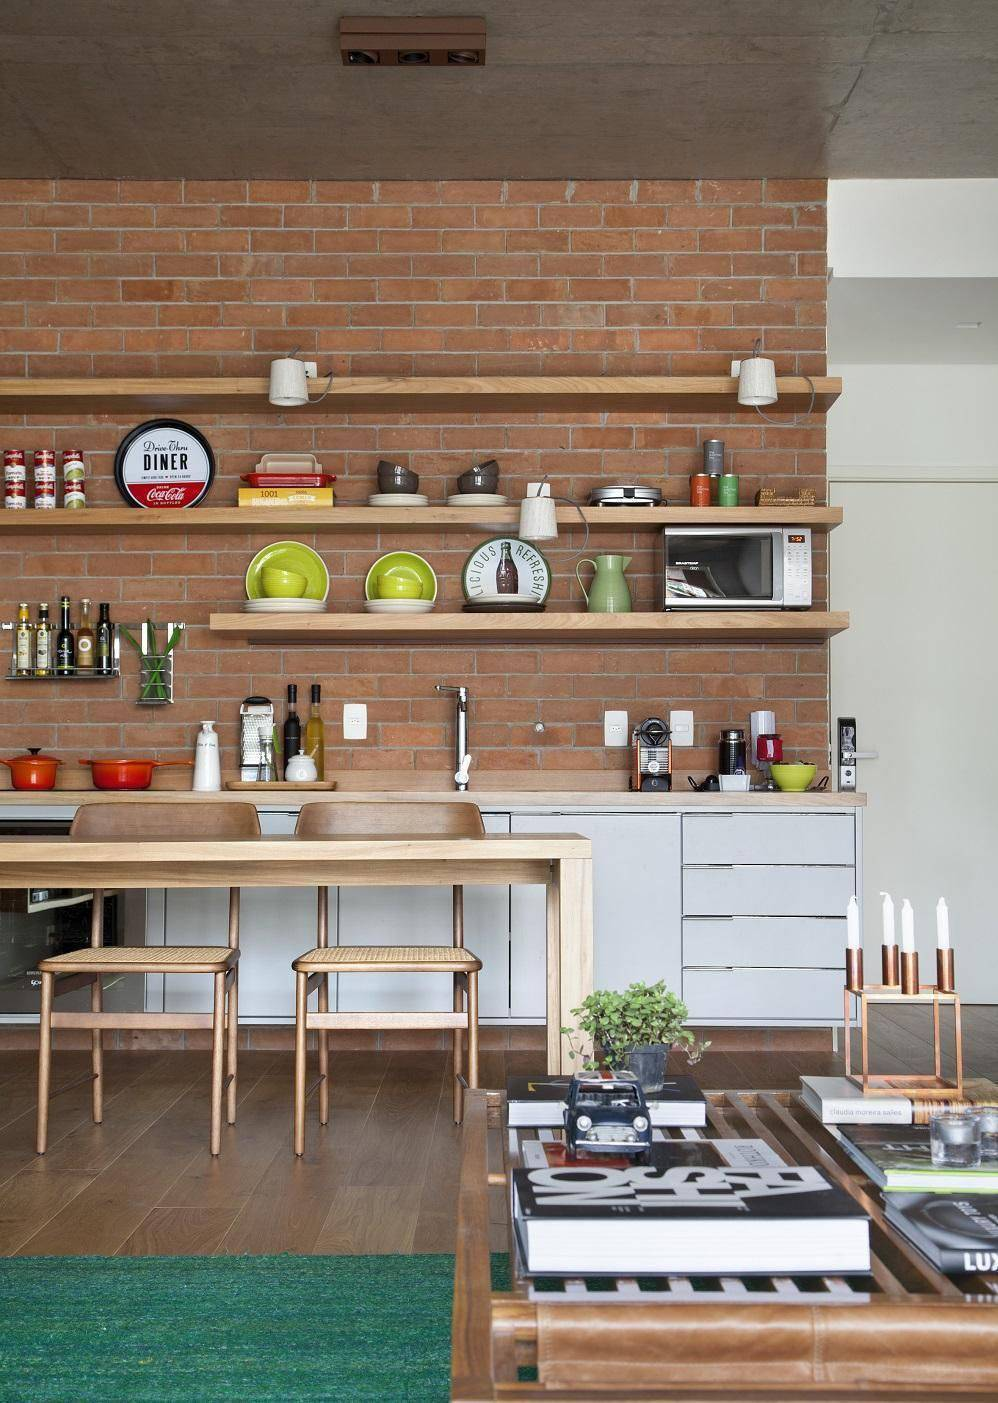 piso vinilico cozinha americana migs arquitetura 24662